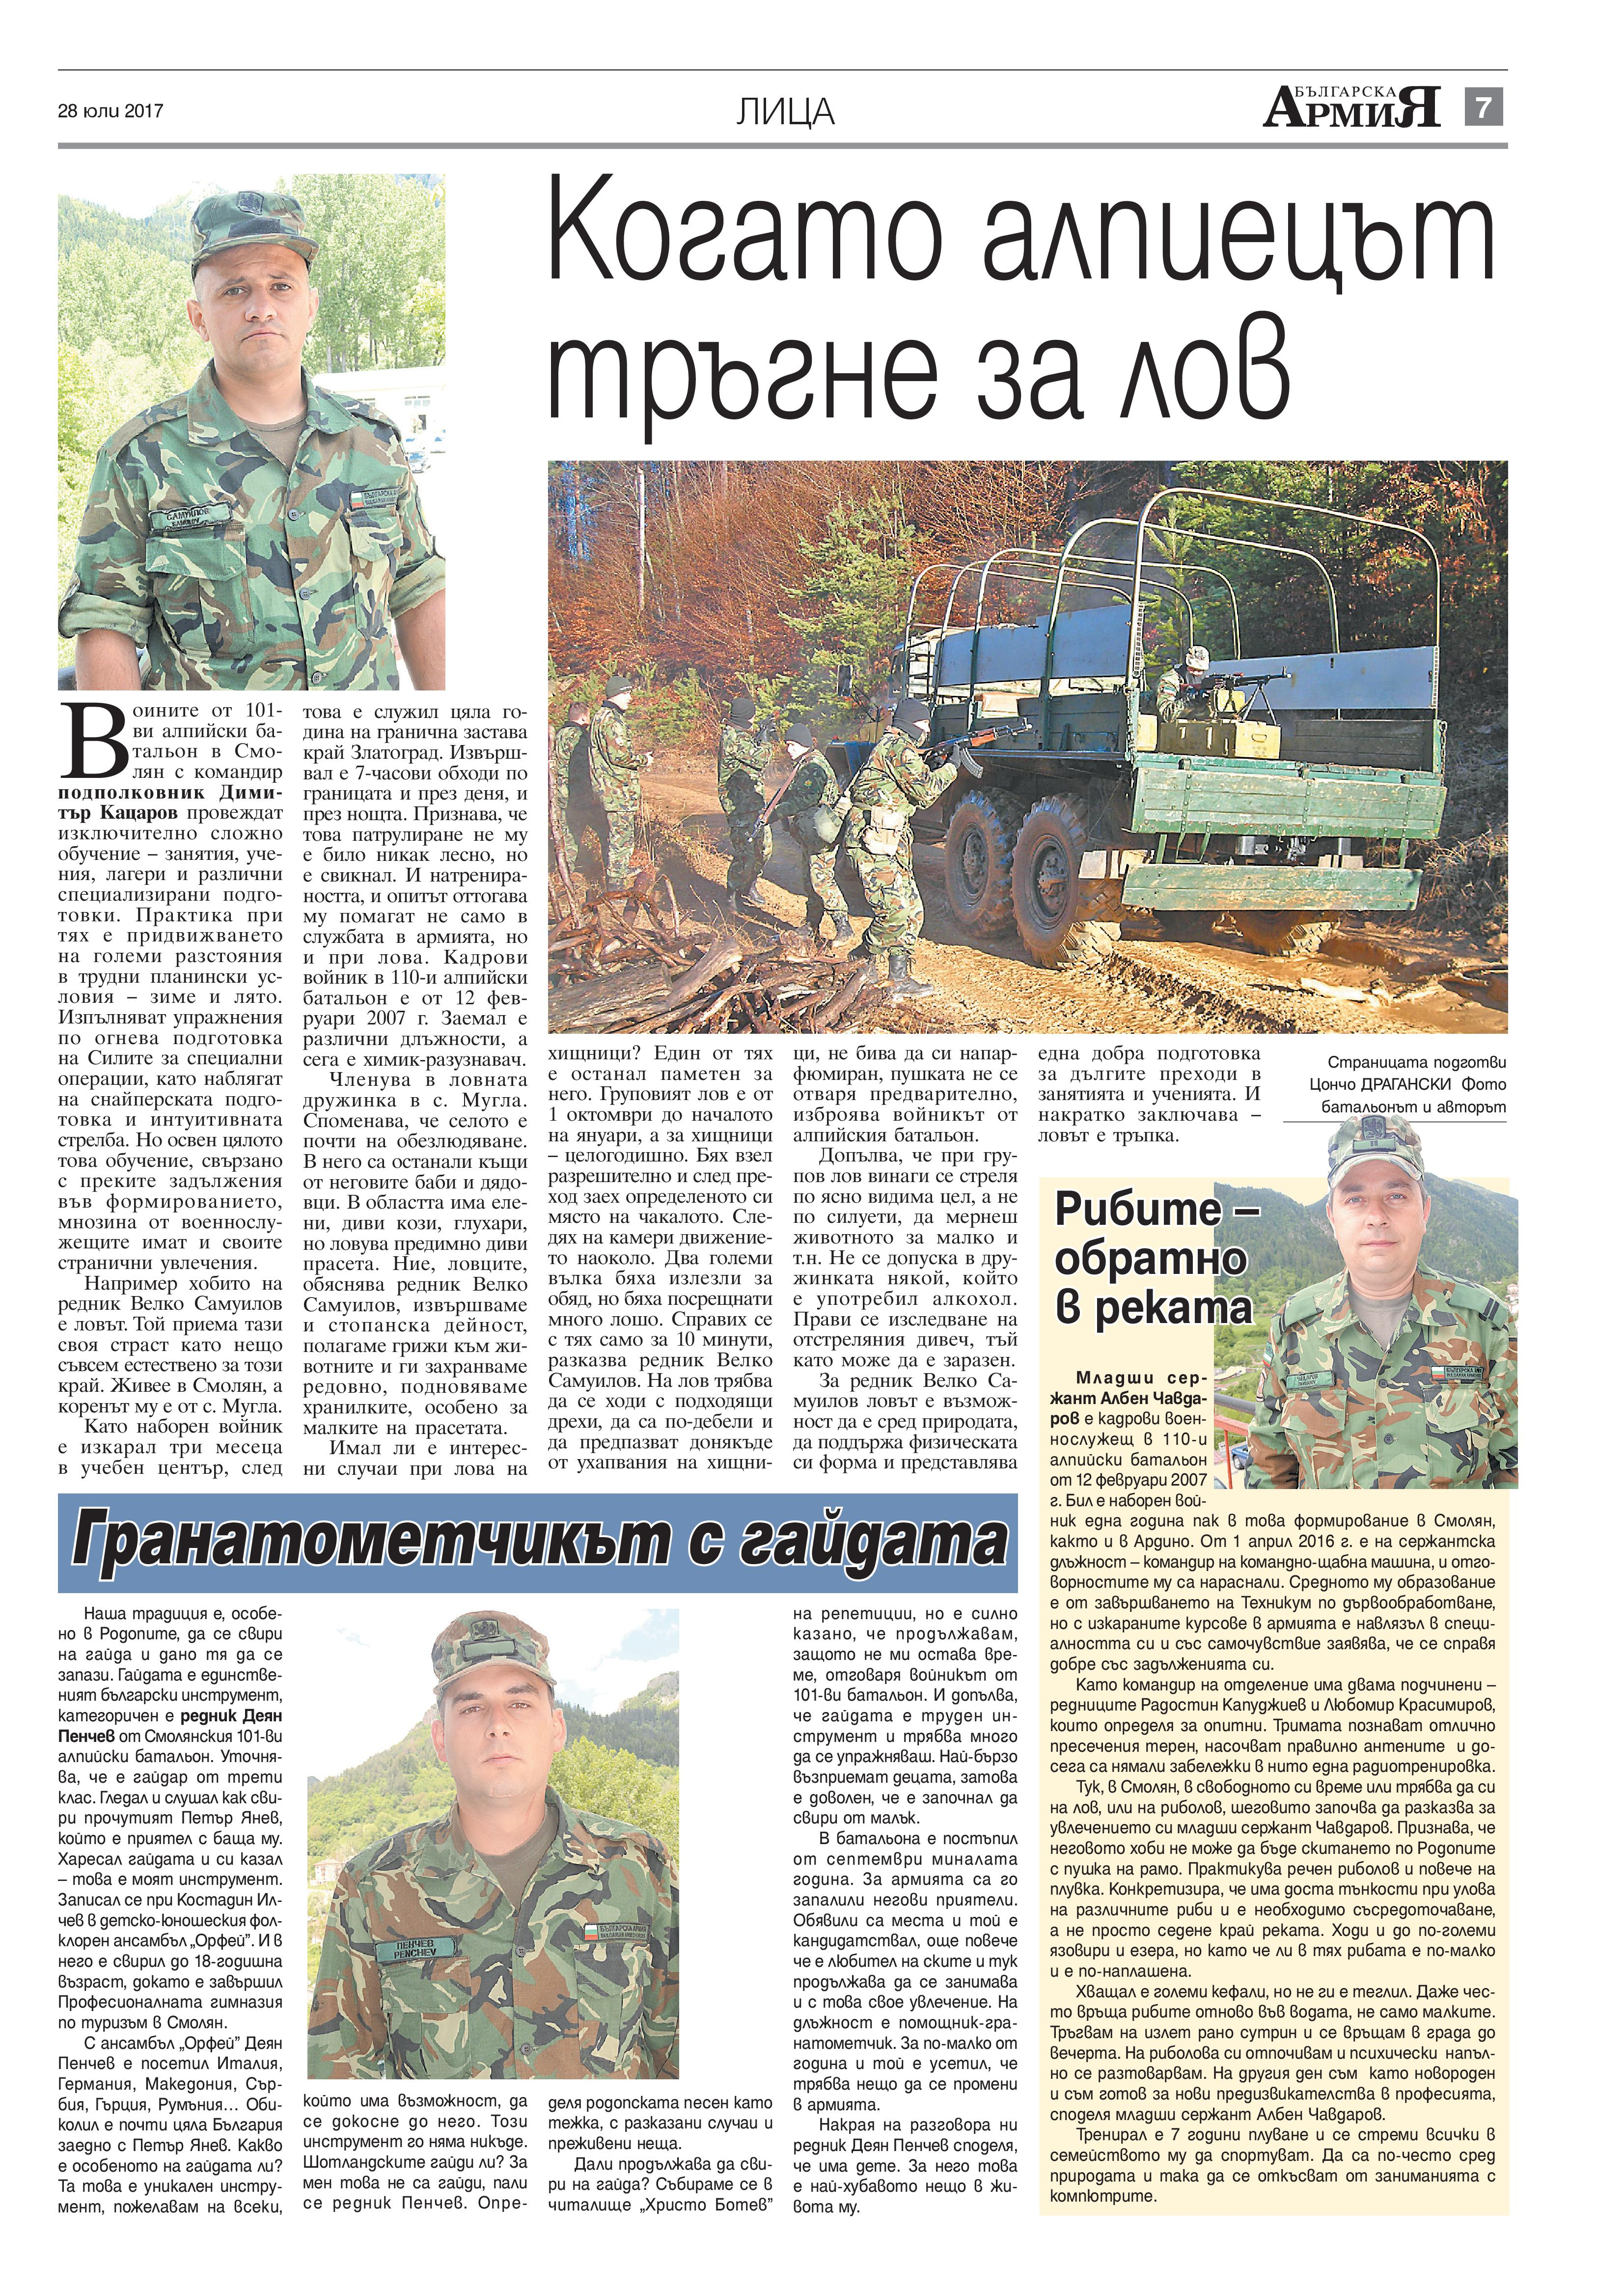 https://www.armymedia.bg/wp-content/uploads/2015/06/07-6.jpg